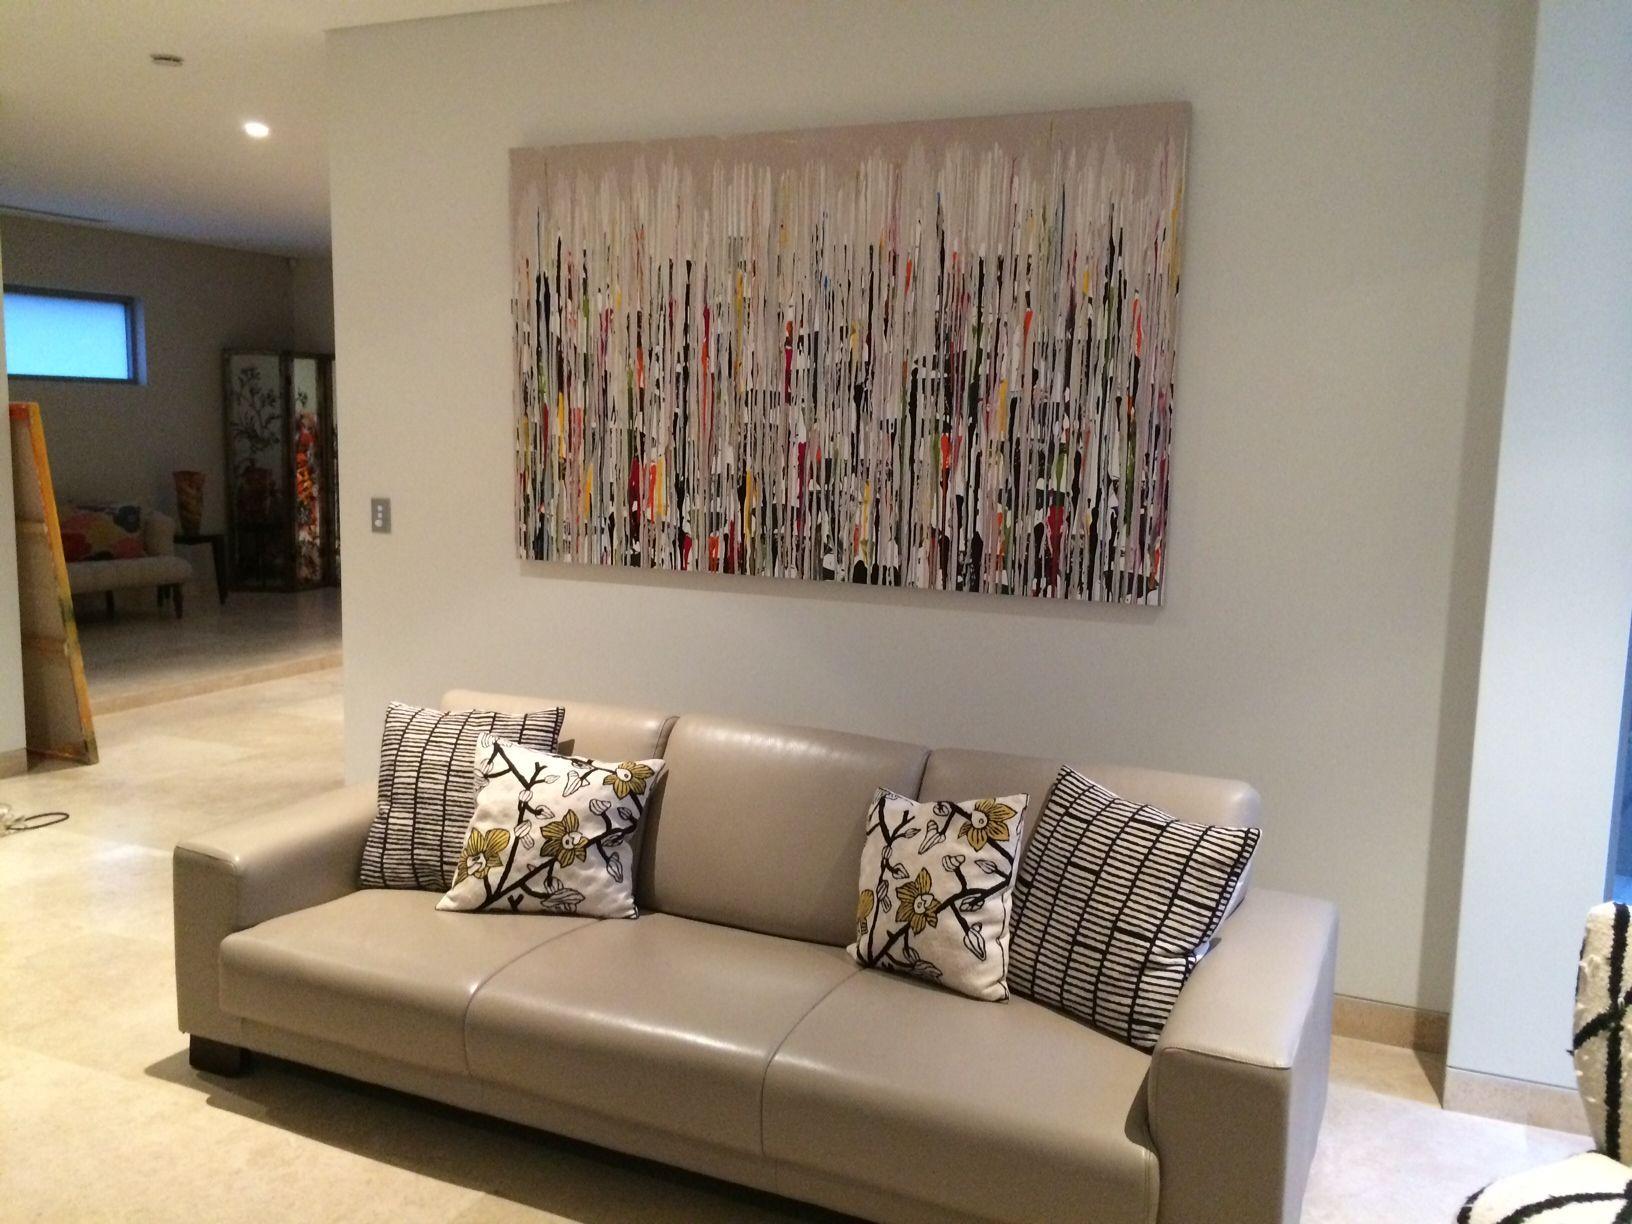 Hidden City larges interior design abstract artwork | Pinturas ...